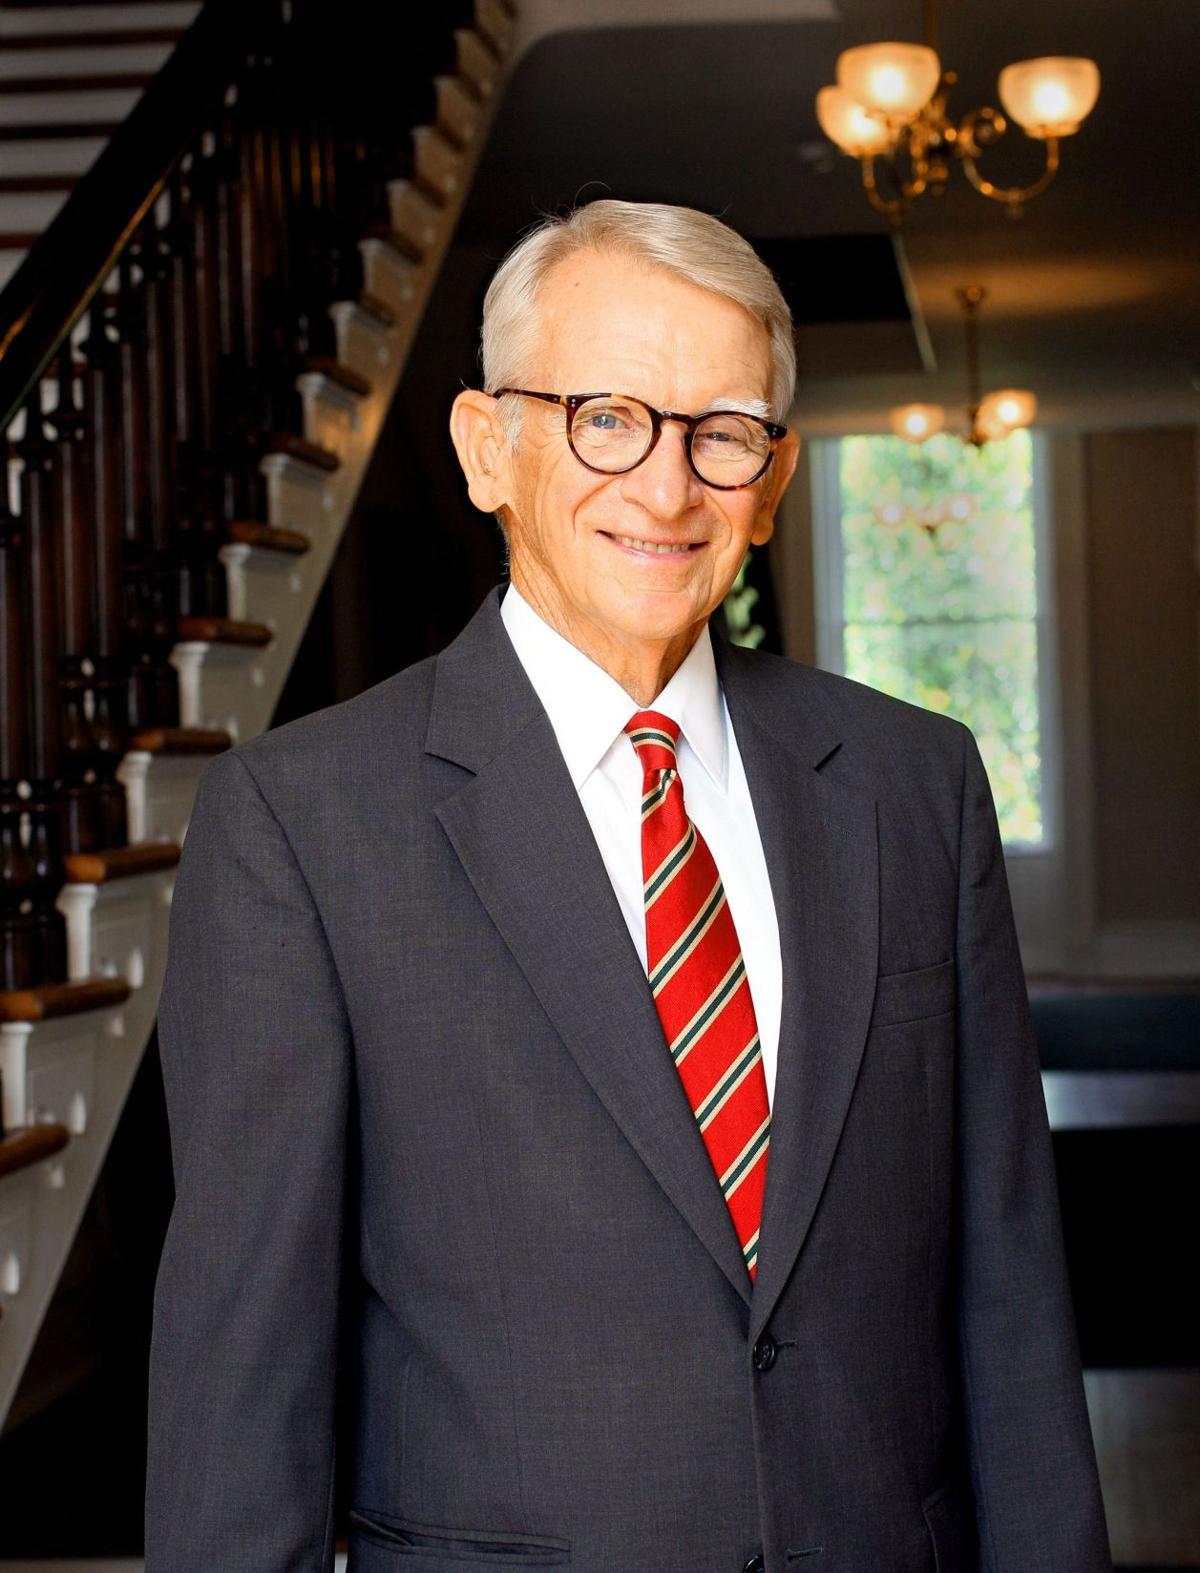 Charleston Mayor Joe Riley to serve on national historic preservation council